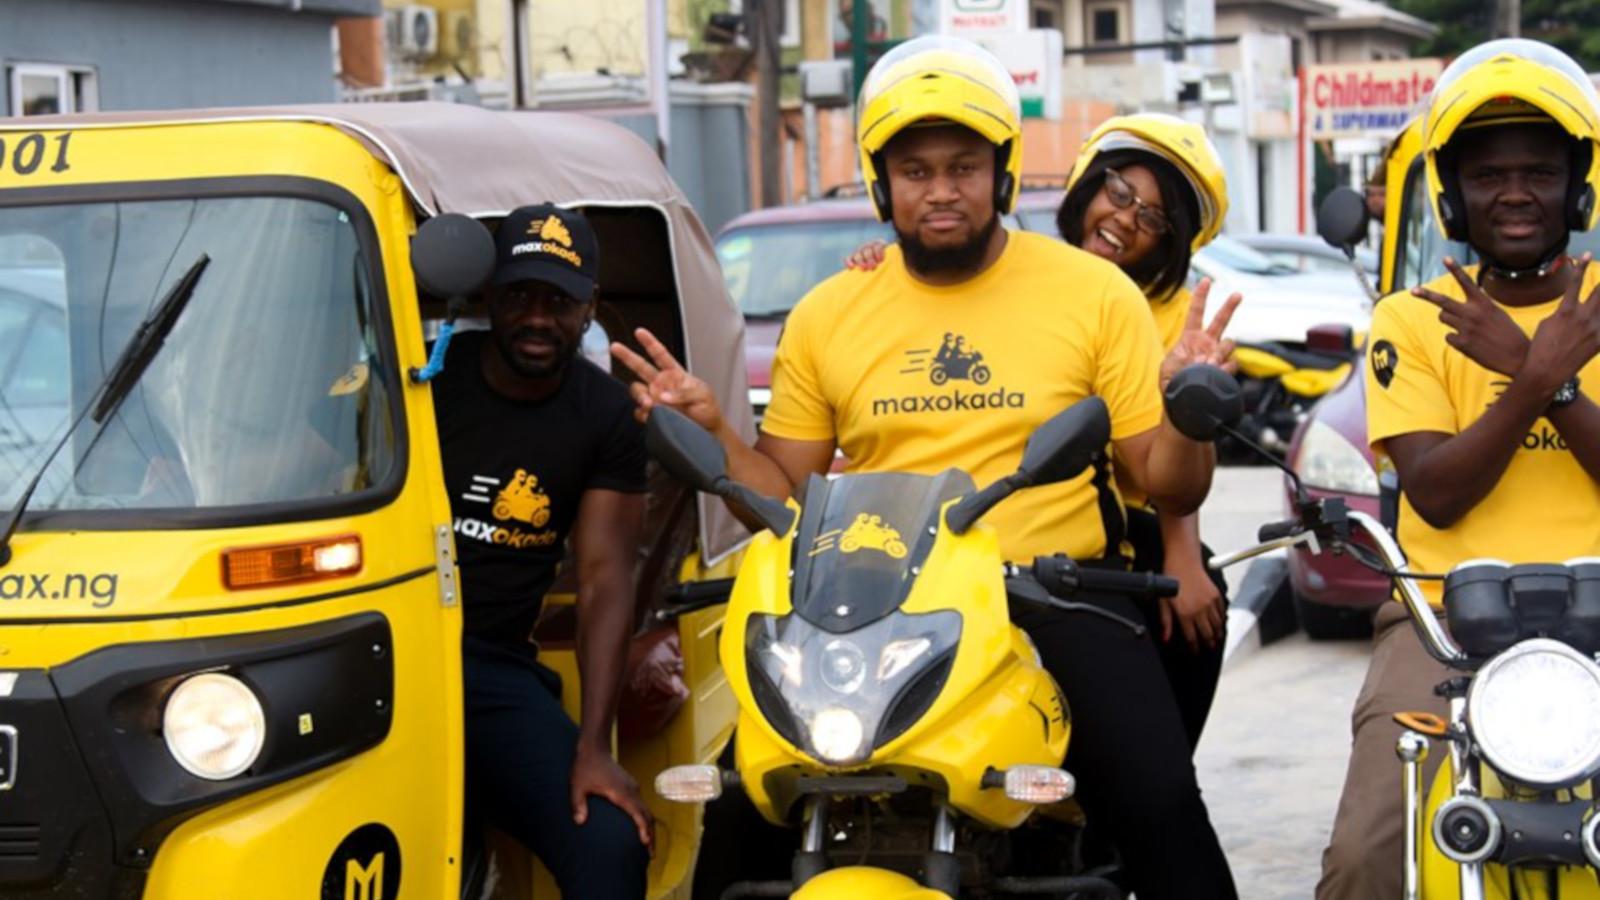 Featured image: MAX Deliver Nigeria (Facebook)